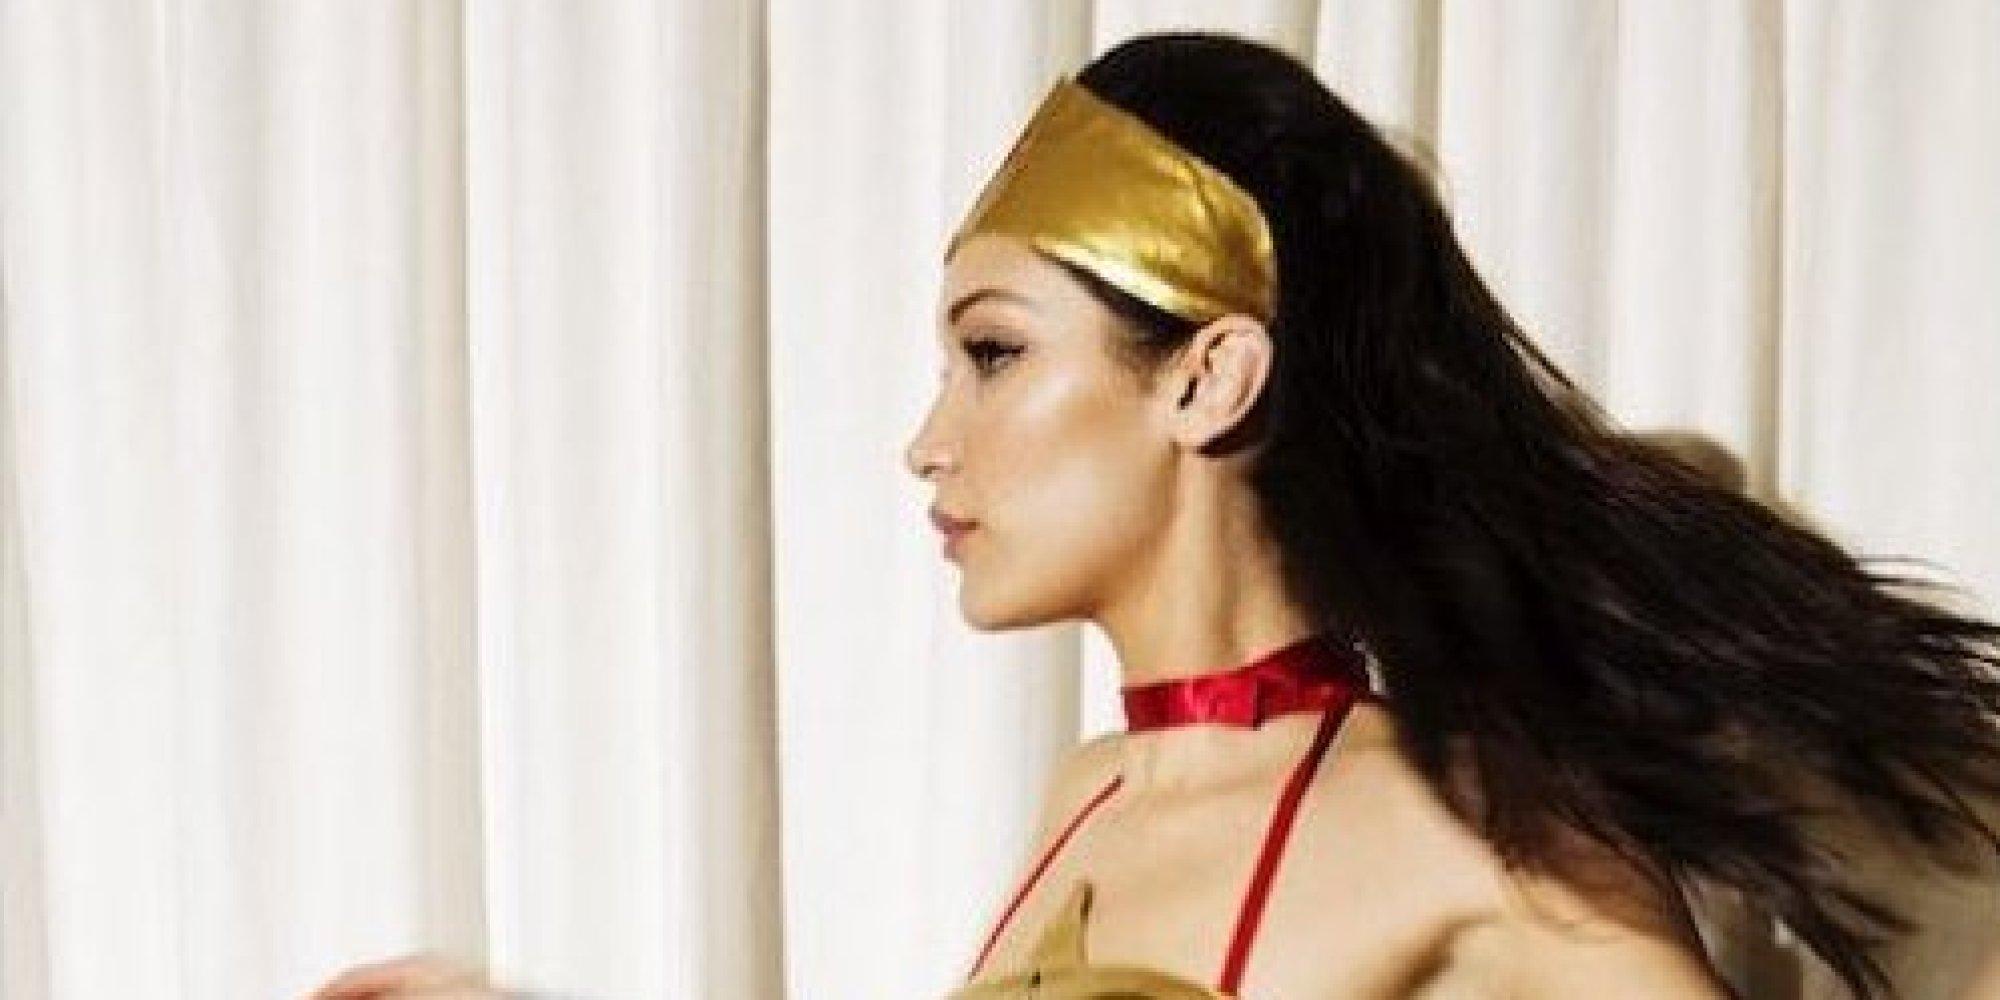 ... Transforms Into Wonder Woman For Love Magazine's 2015 Advent Calendar